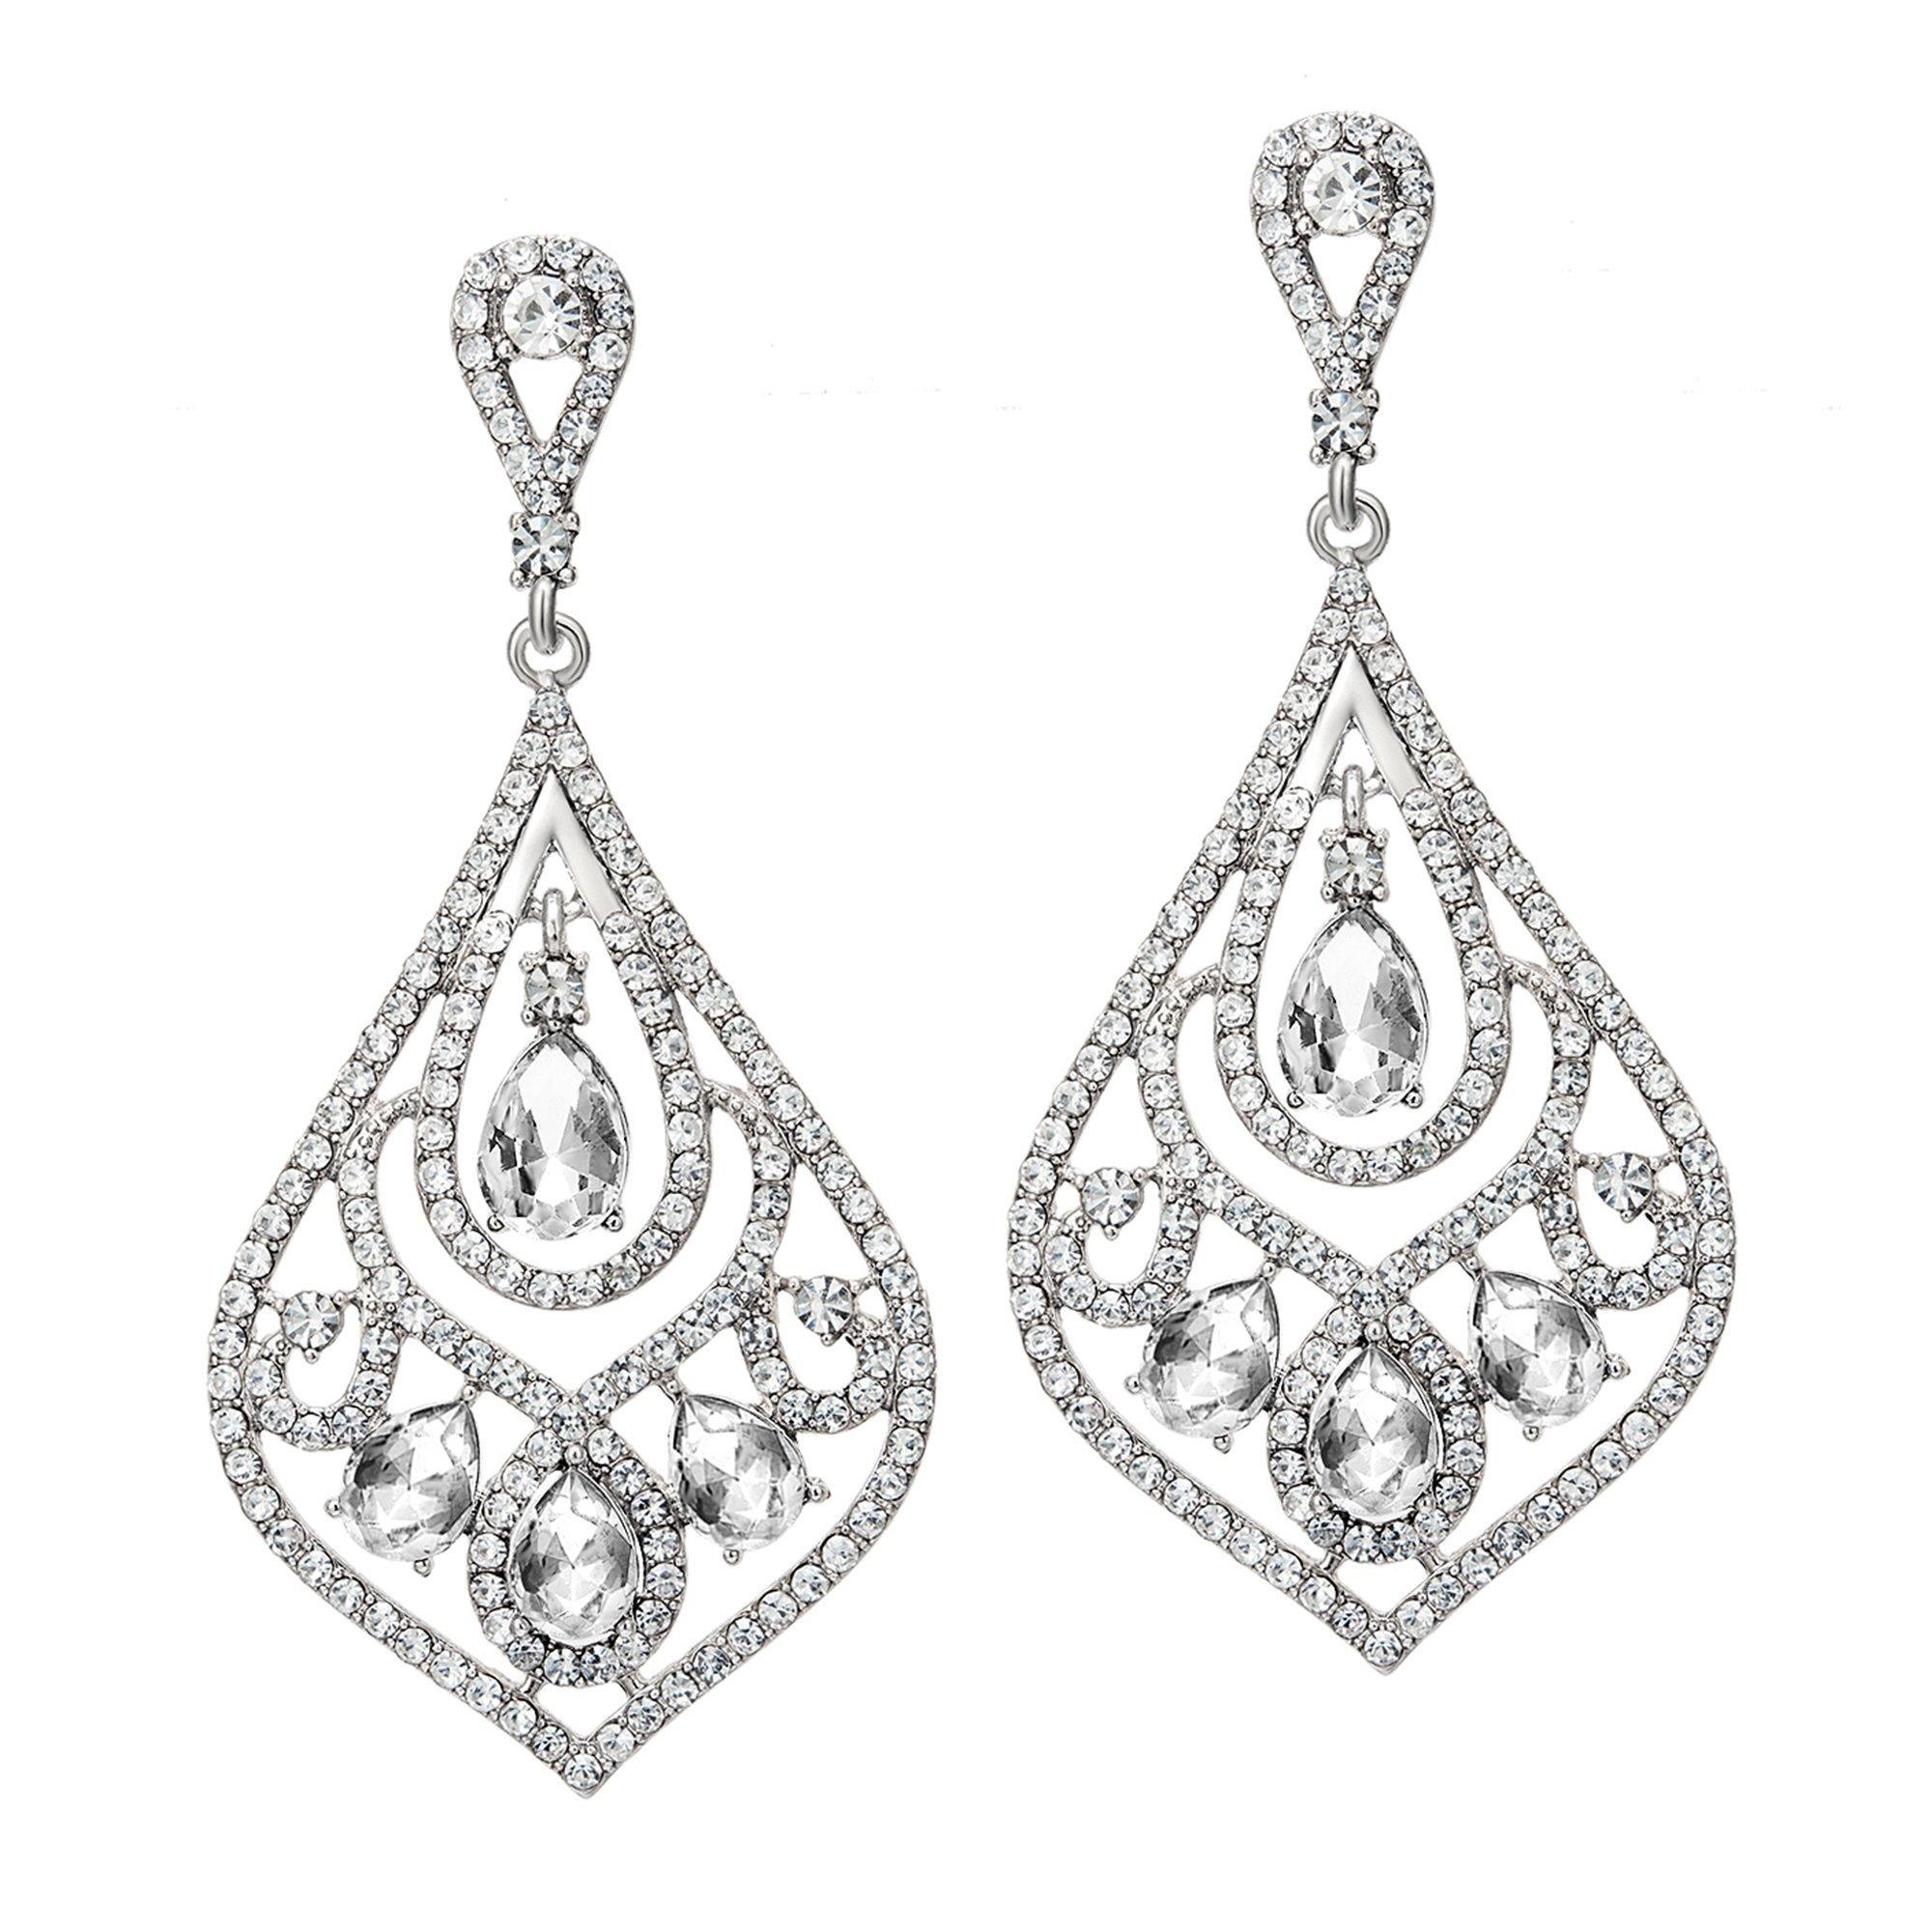 BABEYOND Vintage Wedding Dangle Earrings 1920s Bridal Drop Art Deco Earrings